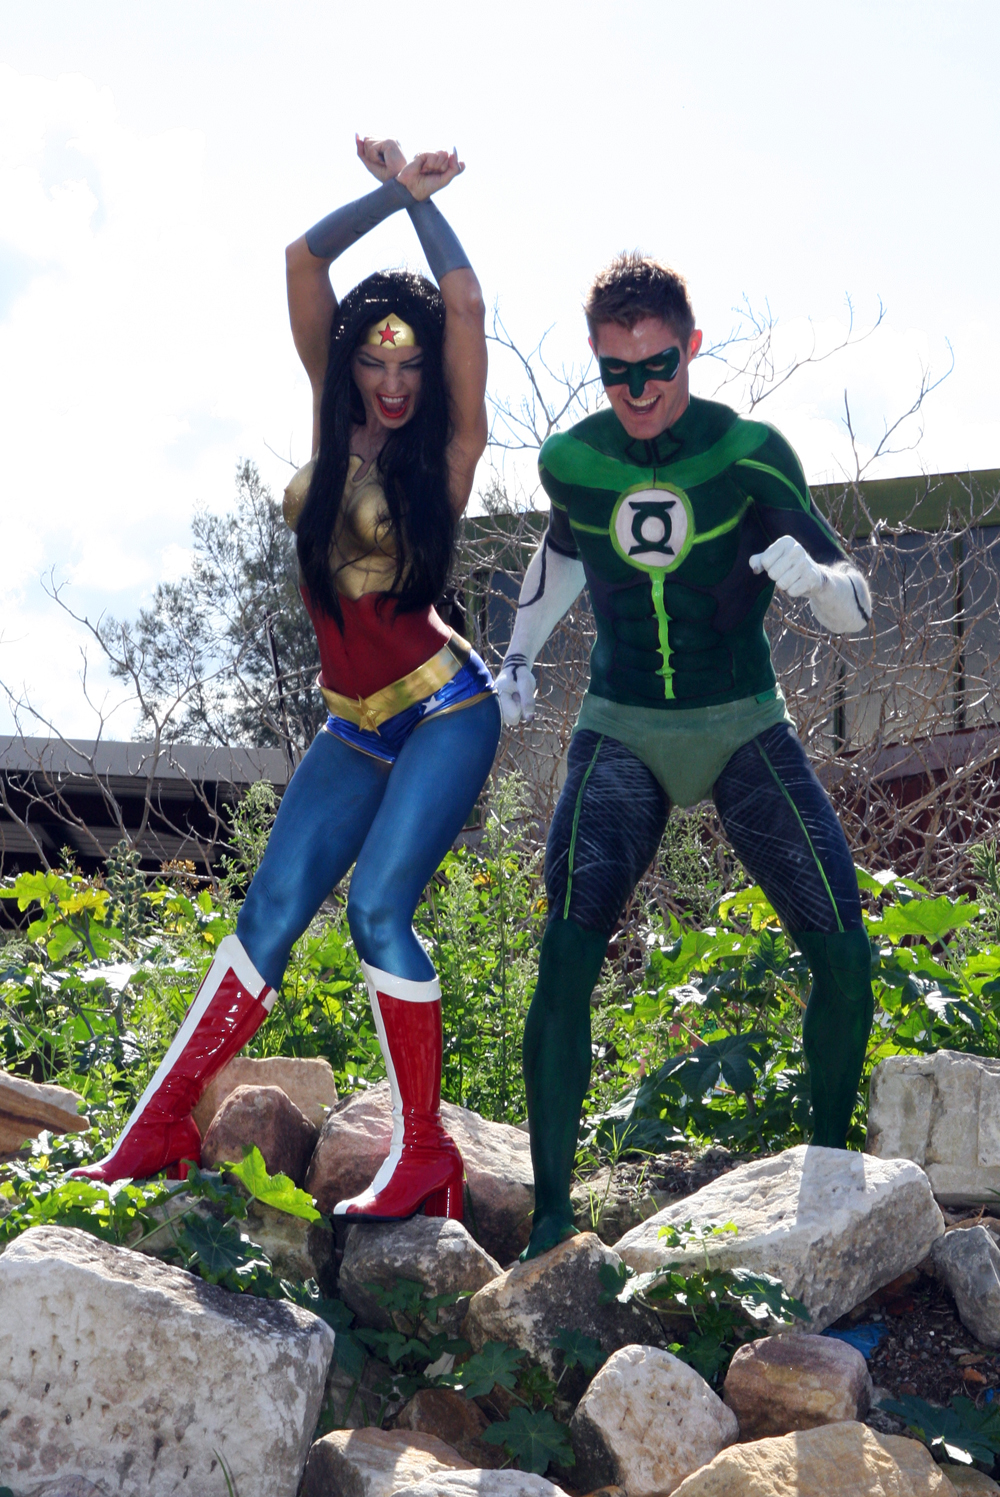 Common Green Lantern Green Lantern